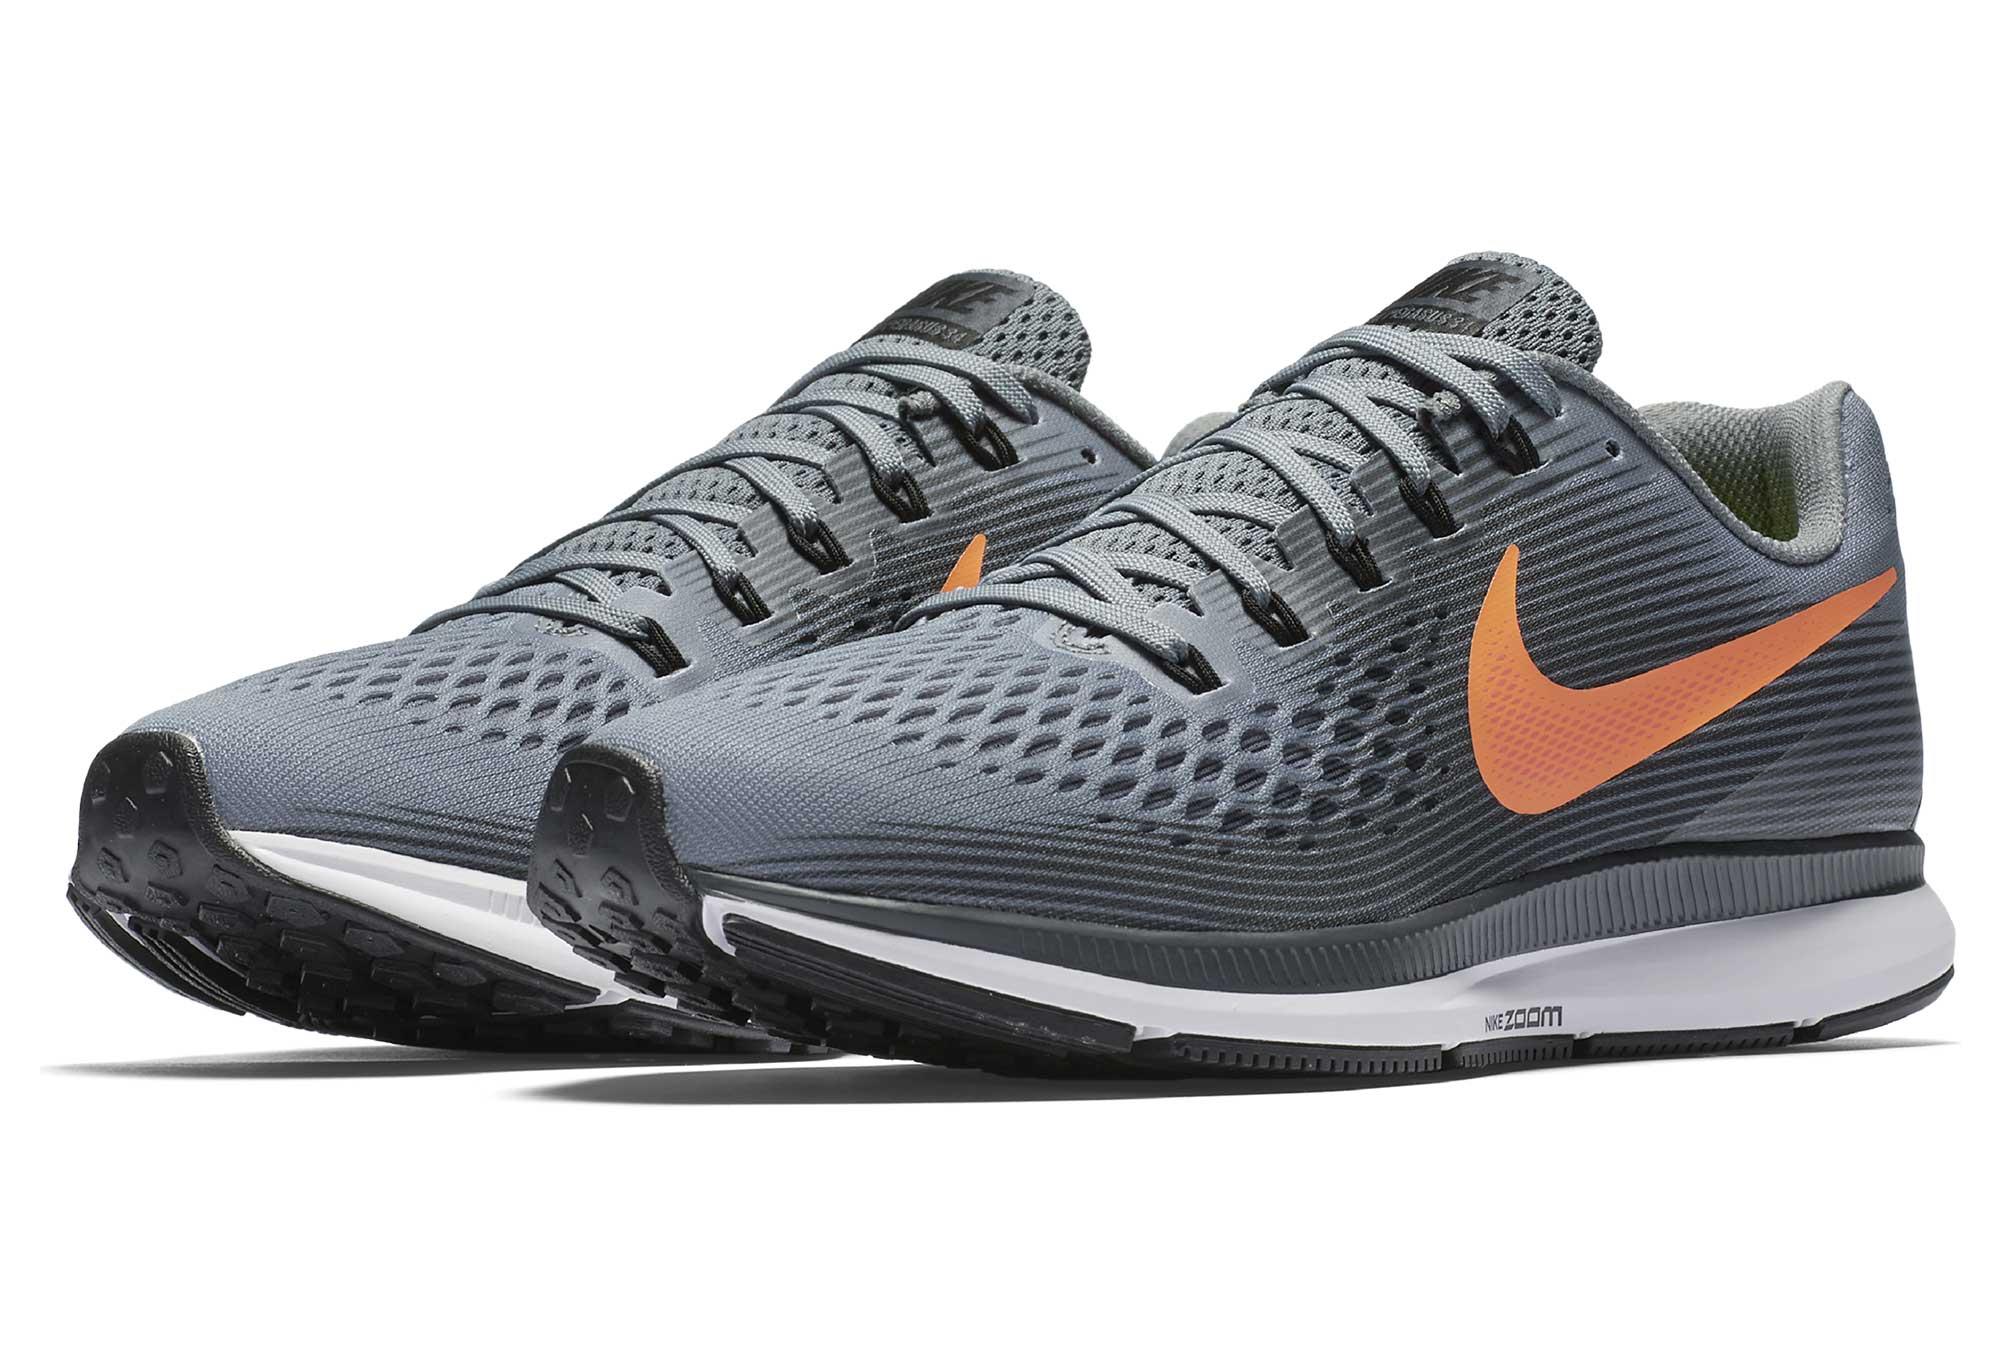 cozy fresh first look sneakers for cheap NIKE AIR ZOOM PEGASUS 34 Shoes Grey Orange Men